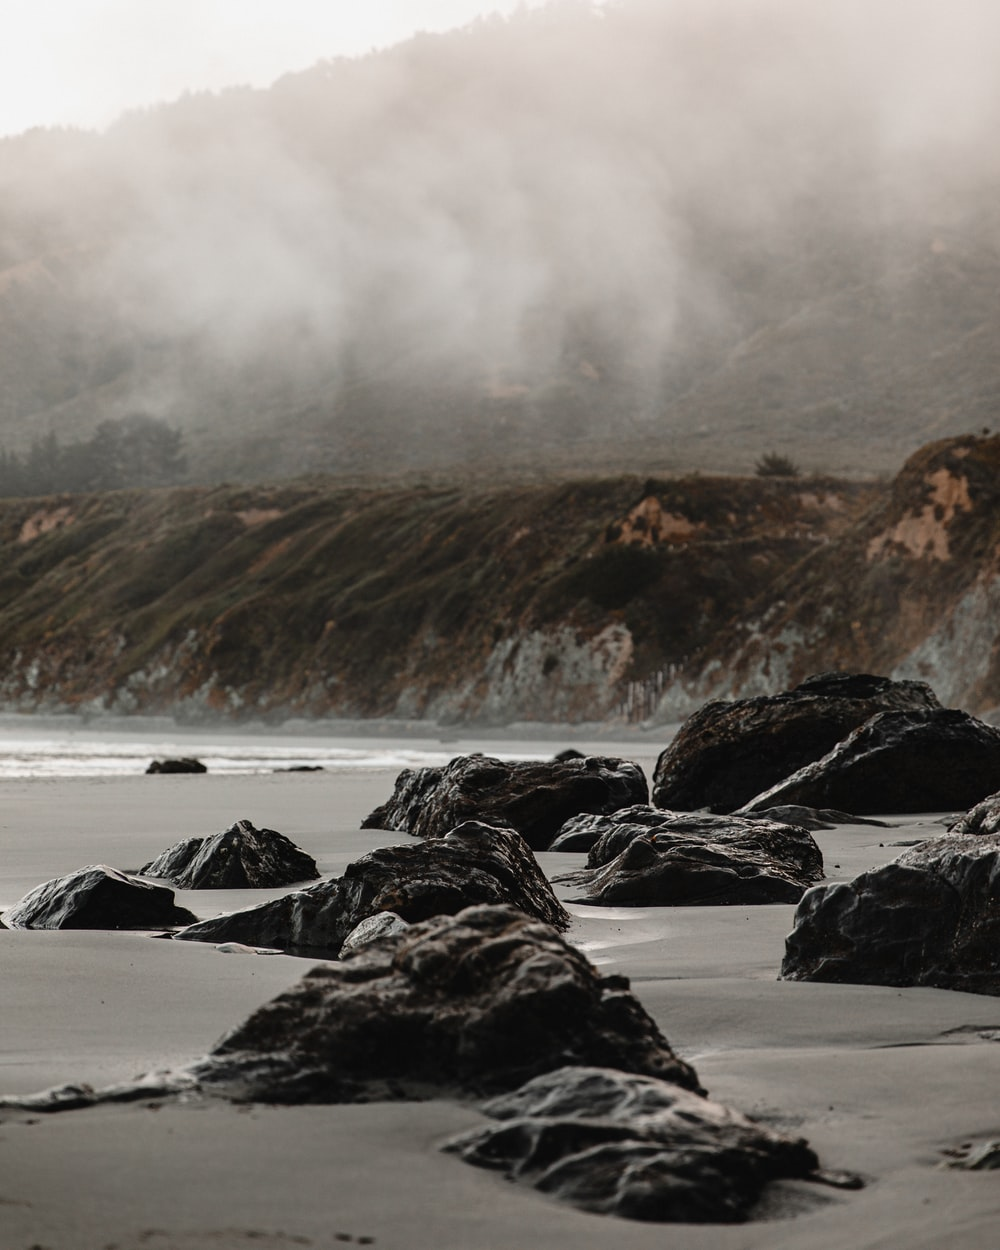 rocky shore with sea waves crashing on rocks